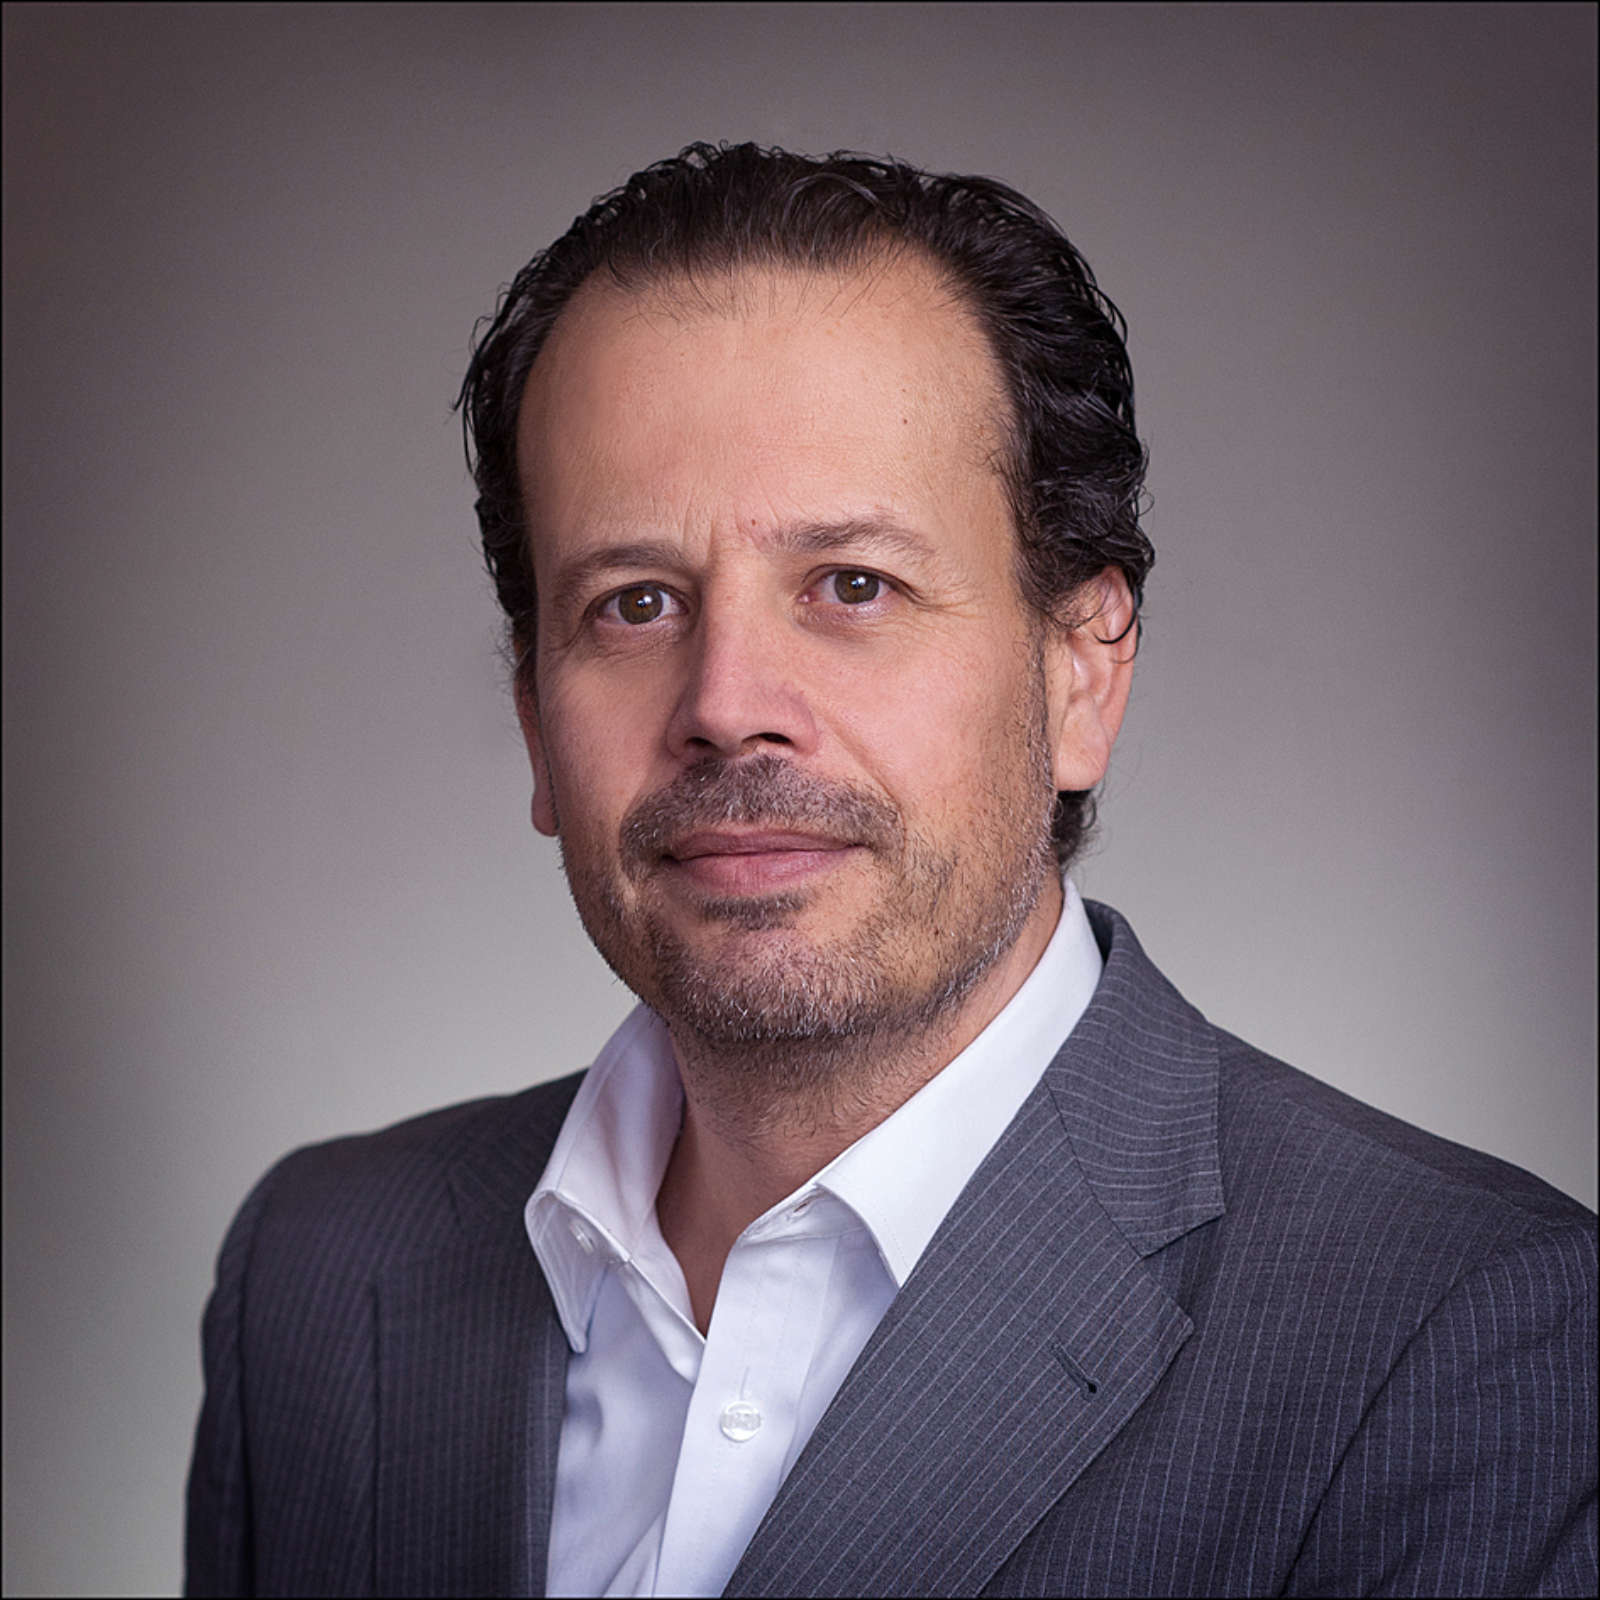 Luis Torregosa